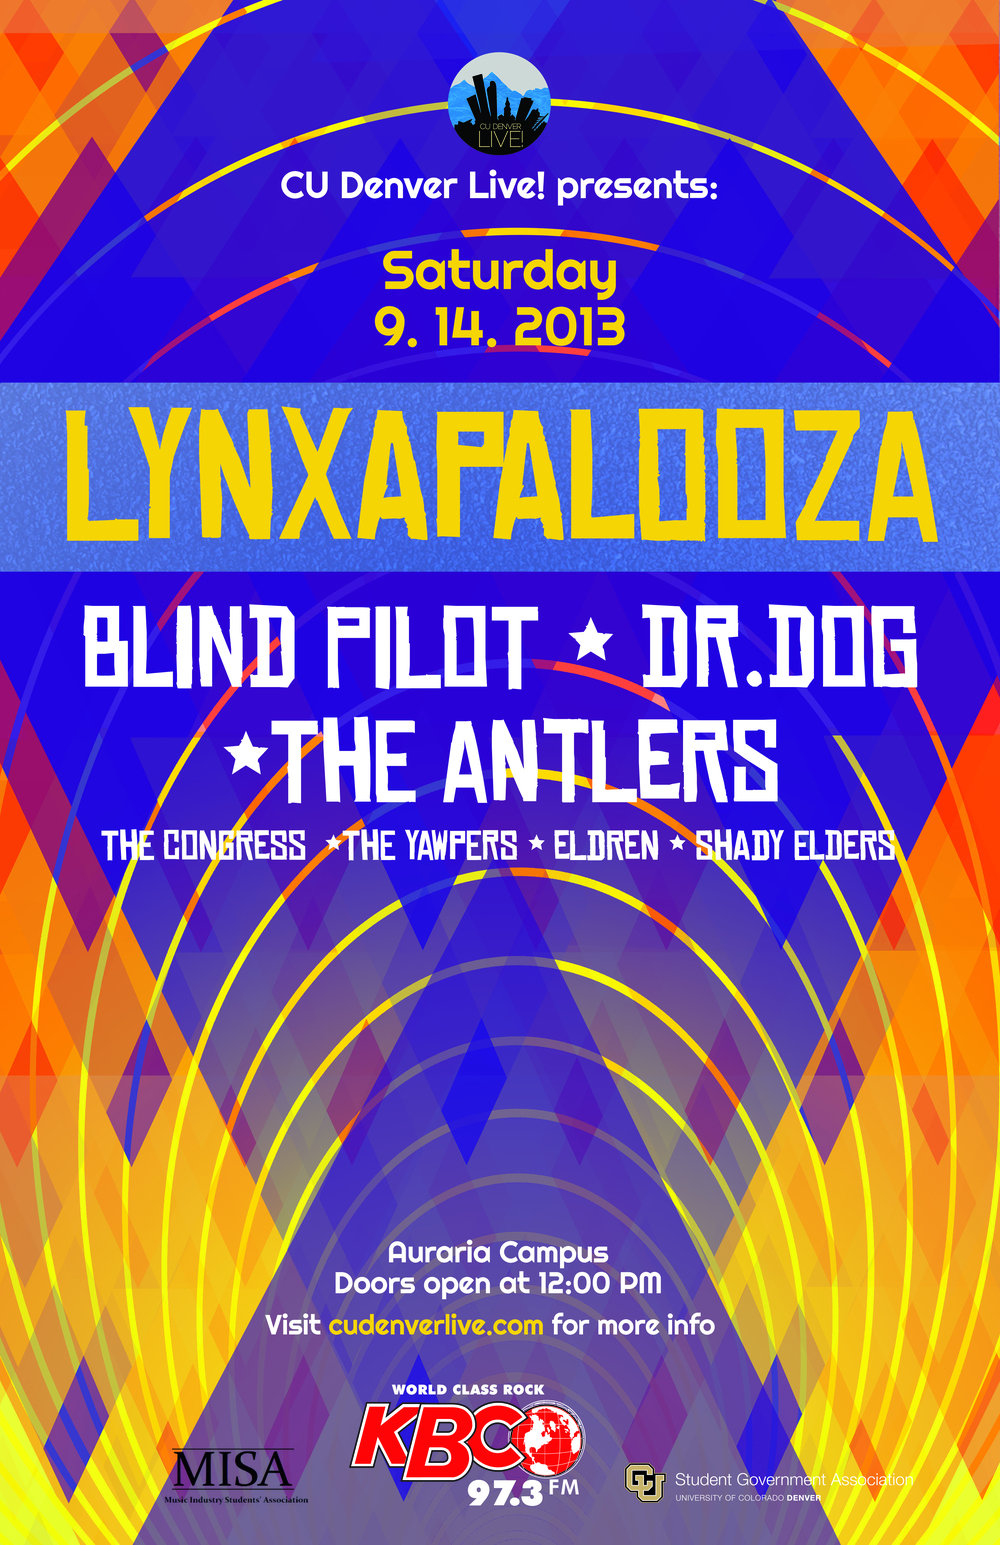 Lynxapalooza Poster.jpg